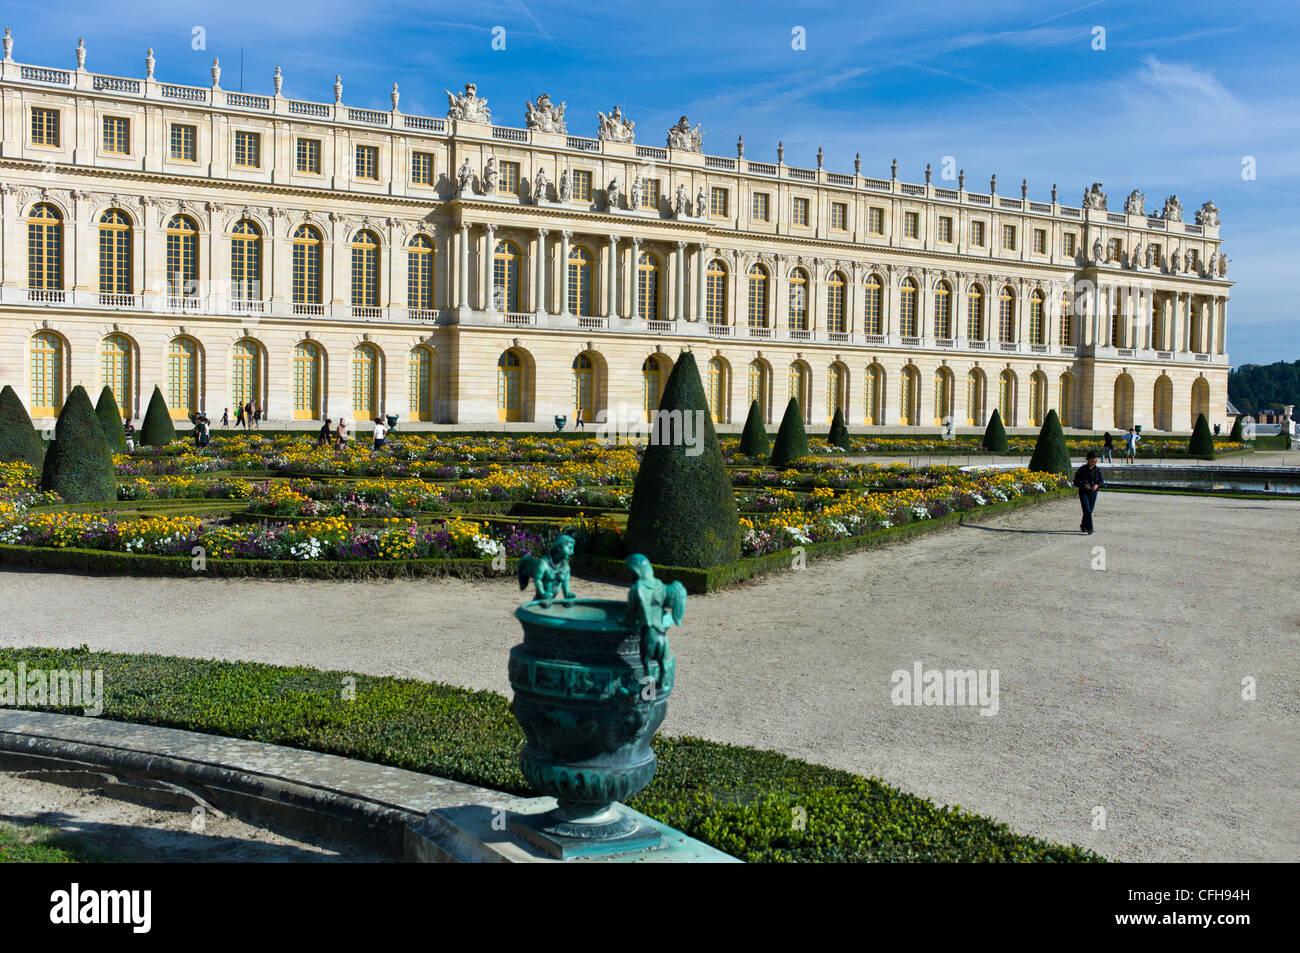 France, Ile de France, Yvelines, Versailles castle, the gardens - Stock Image